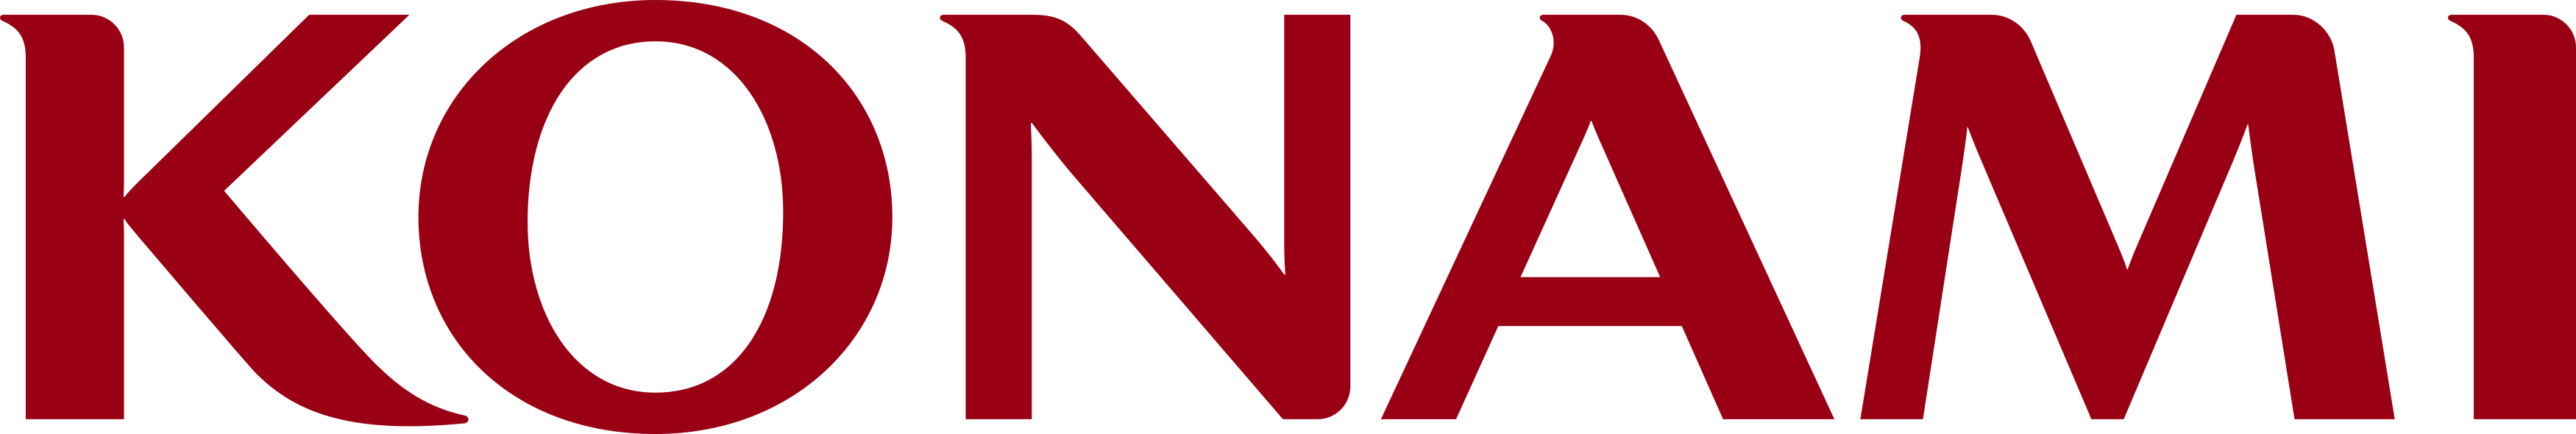 304px-Konami logo svg